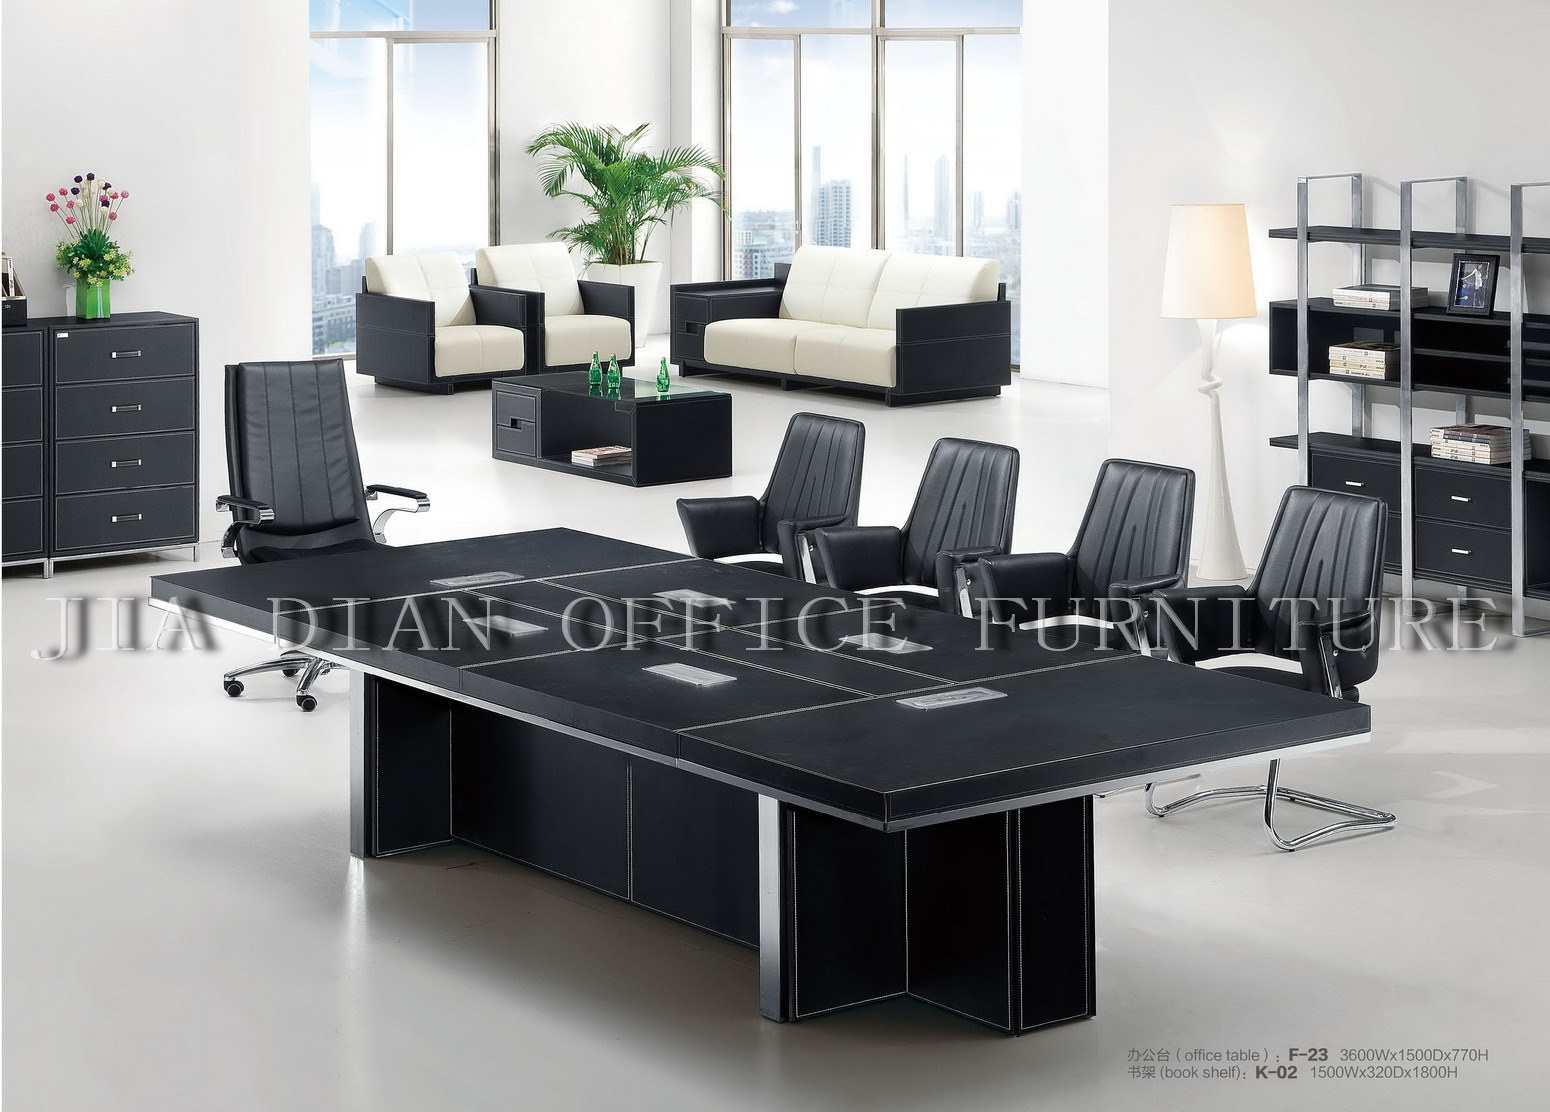 Mesa de reuniones escritorio de oficina f 23 mesa de for Factory oficina